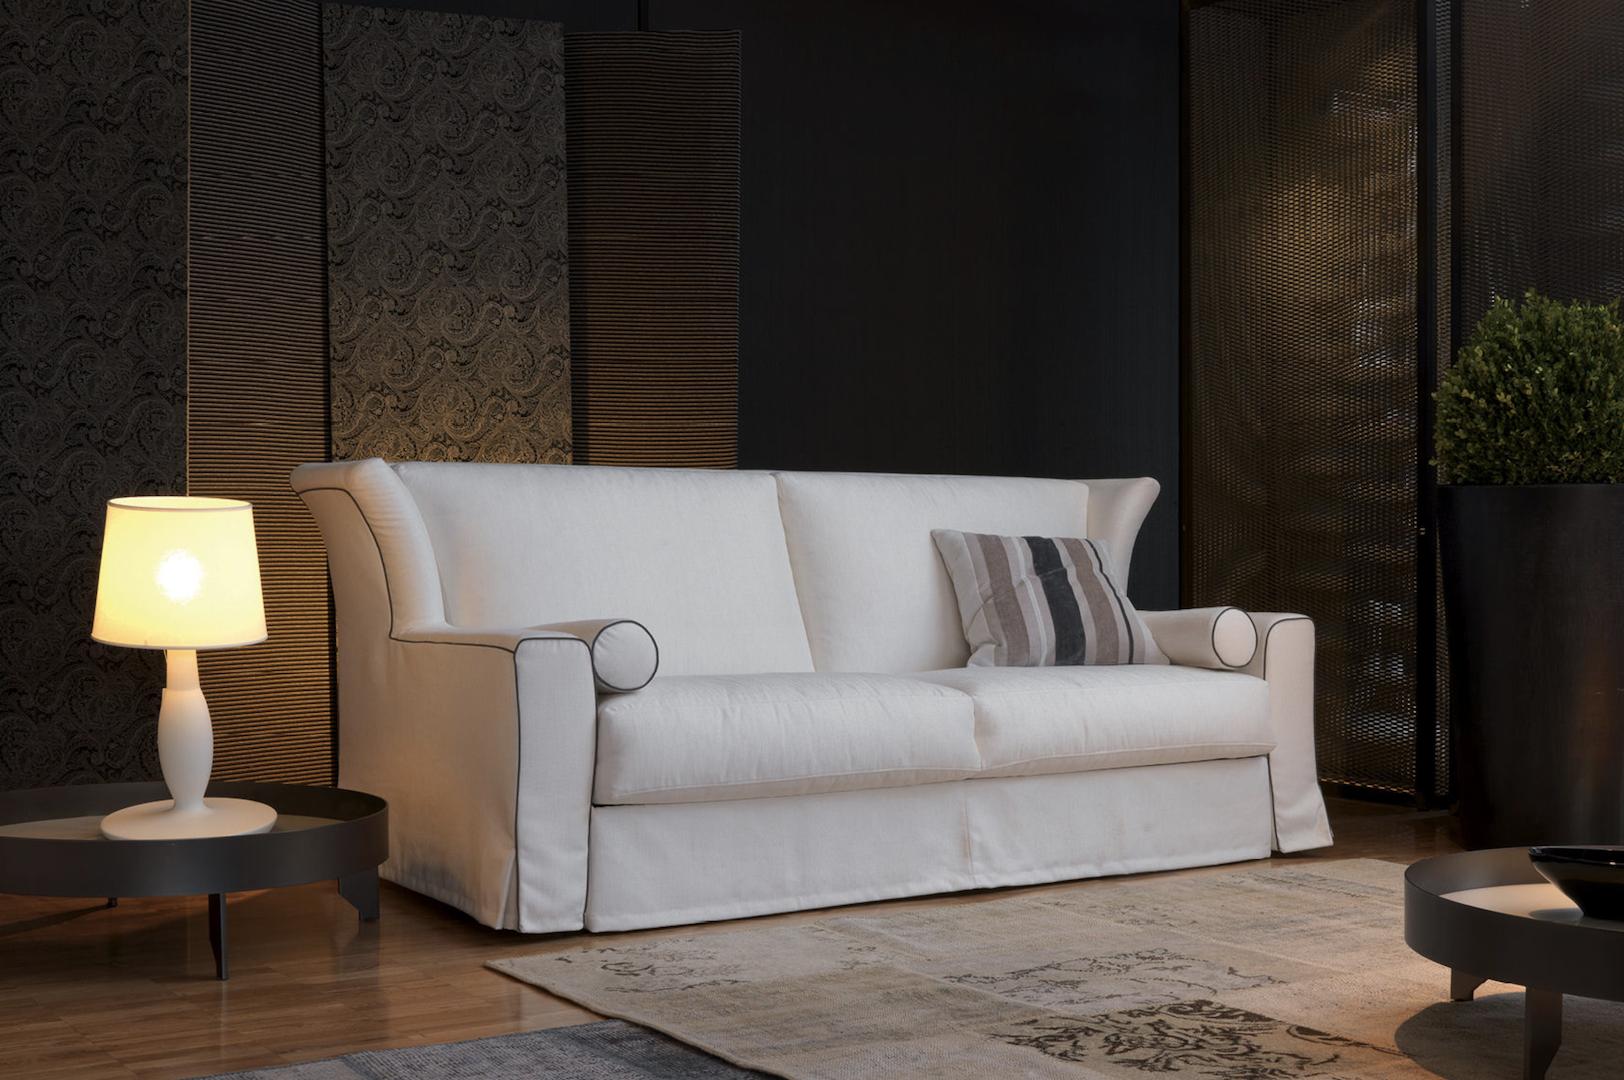 SBD 130 Modern Sofa Beds